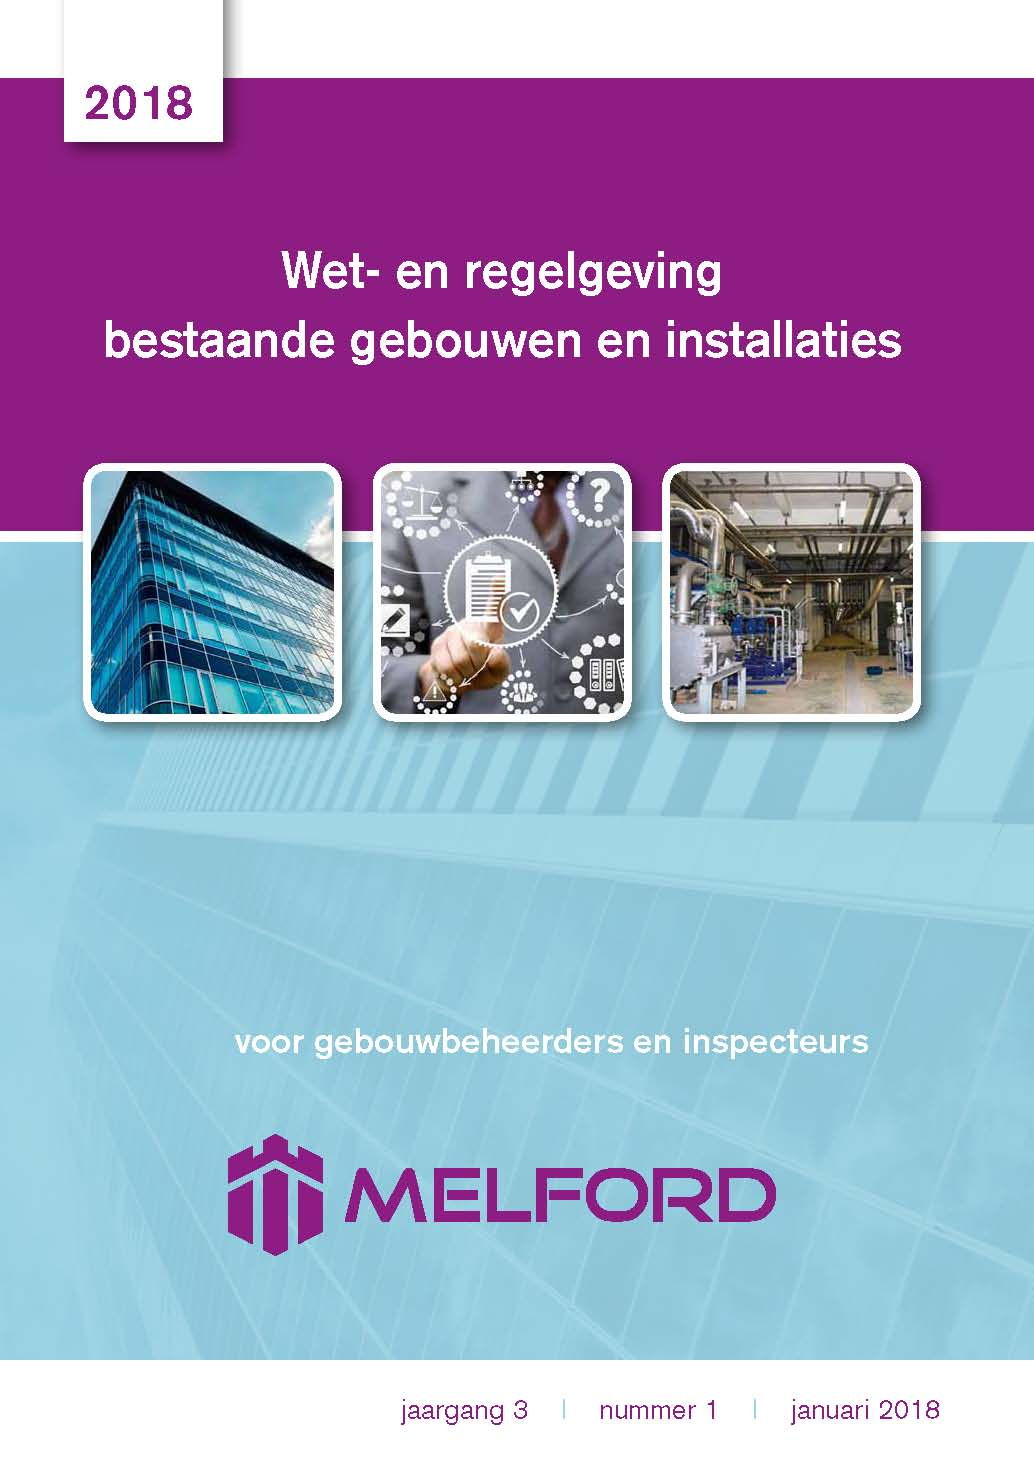 "<a href=""https://melford.nl/zakboek/"" rel=""noopener"" target=""_blank"">Zakboek Wet- en regelgeving</a>"